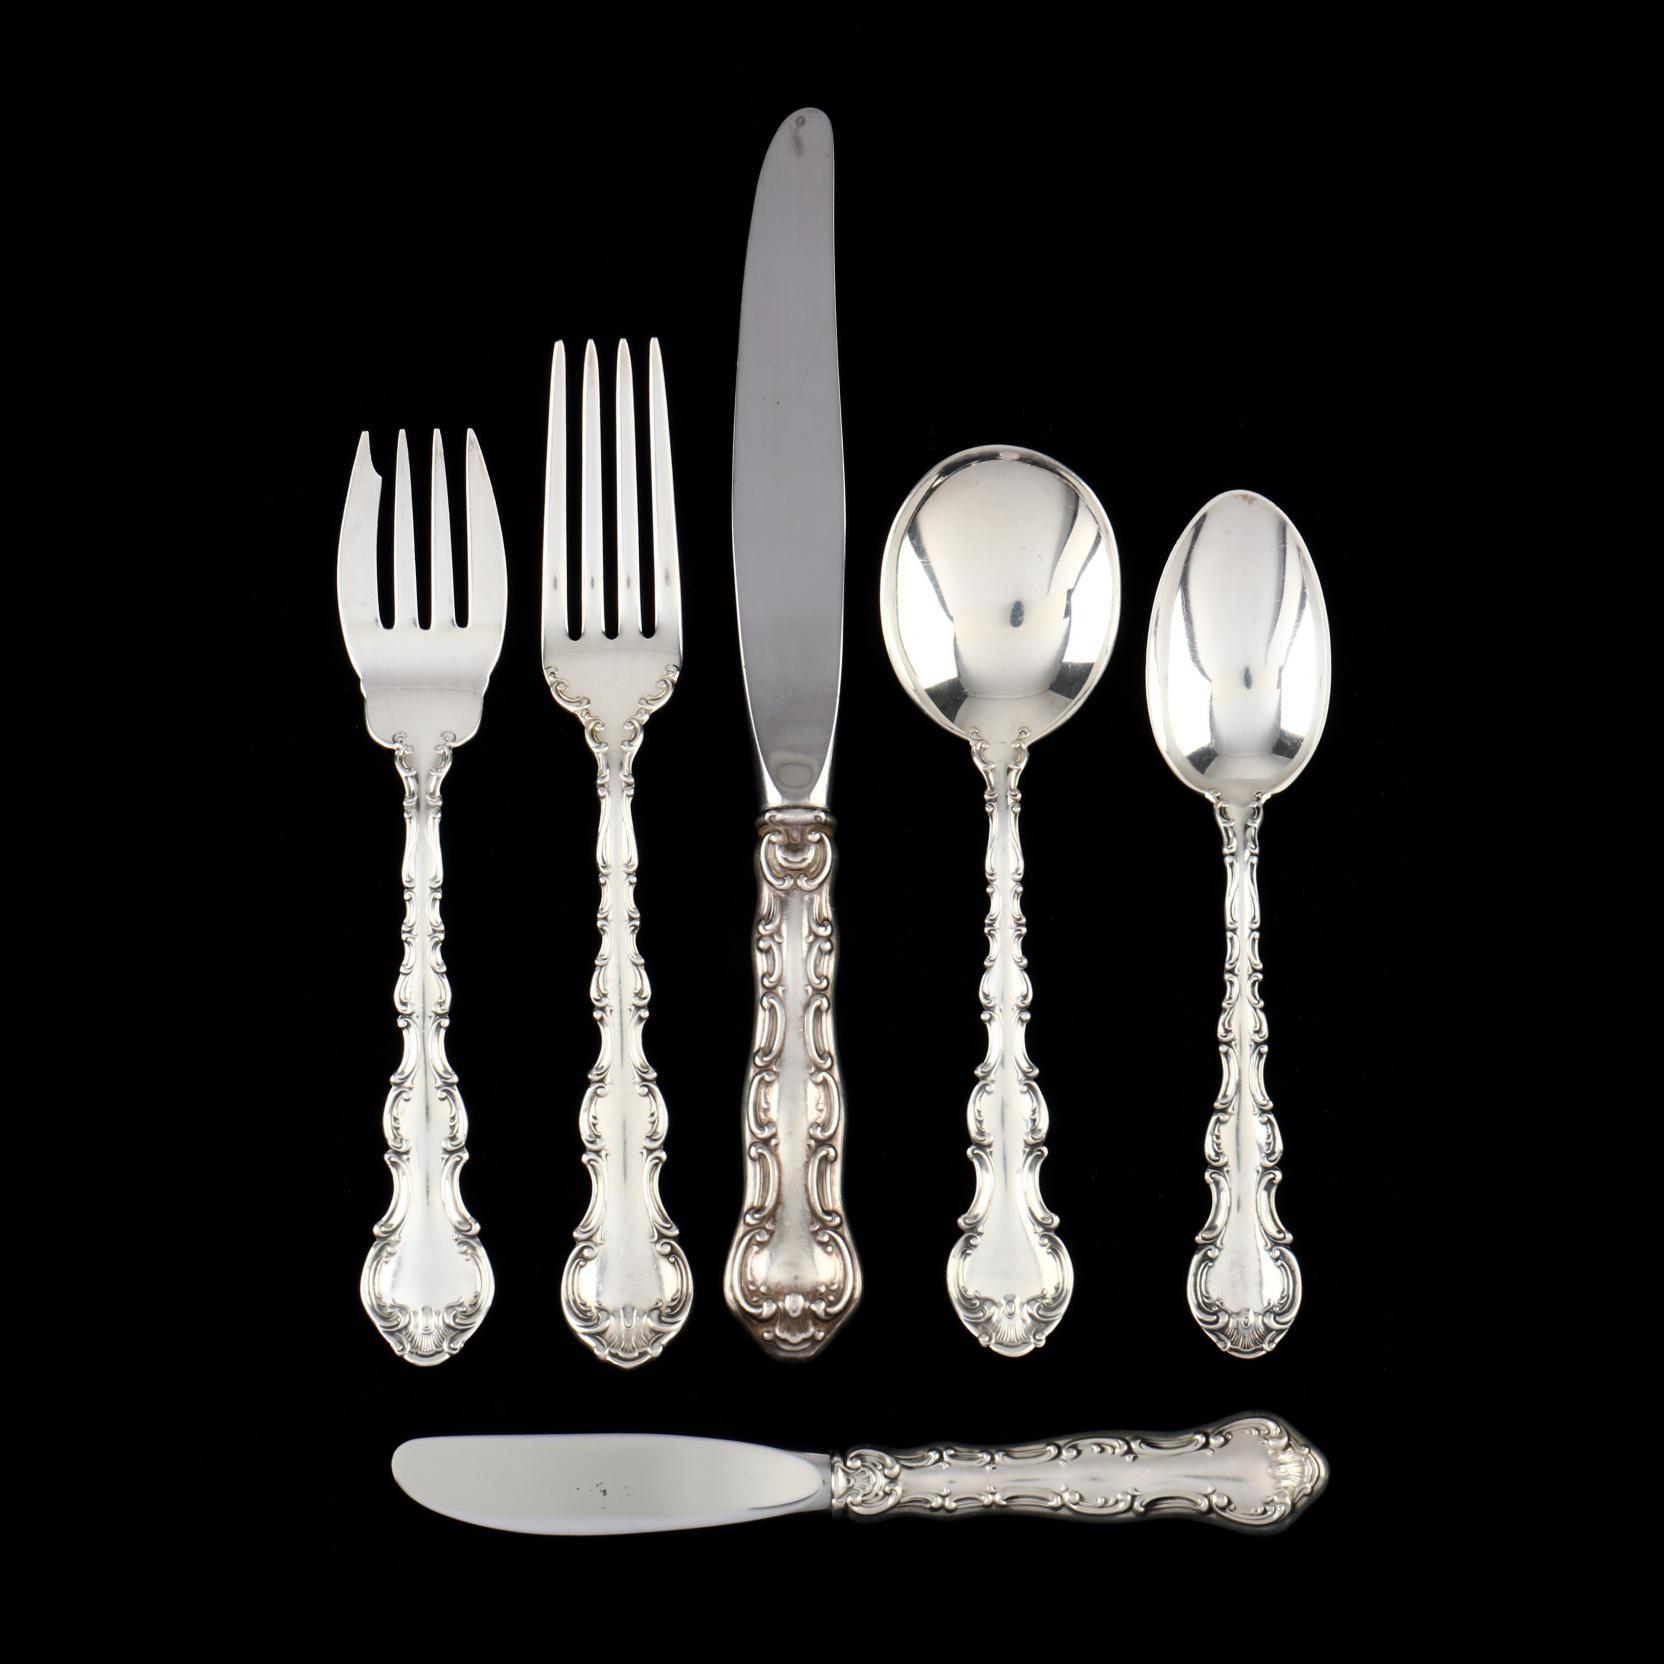 gorham-strasbourg-sterling-silver-flatware-service